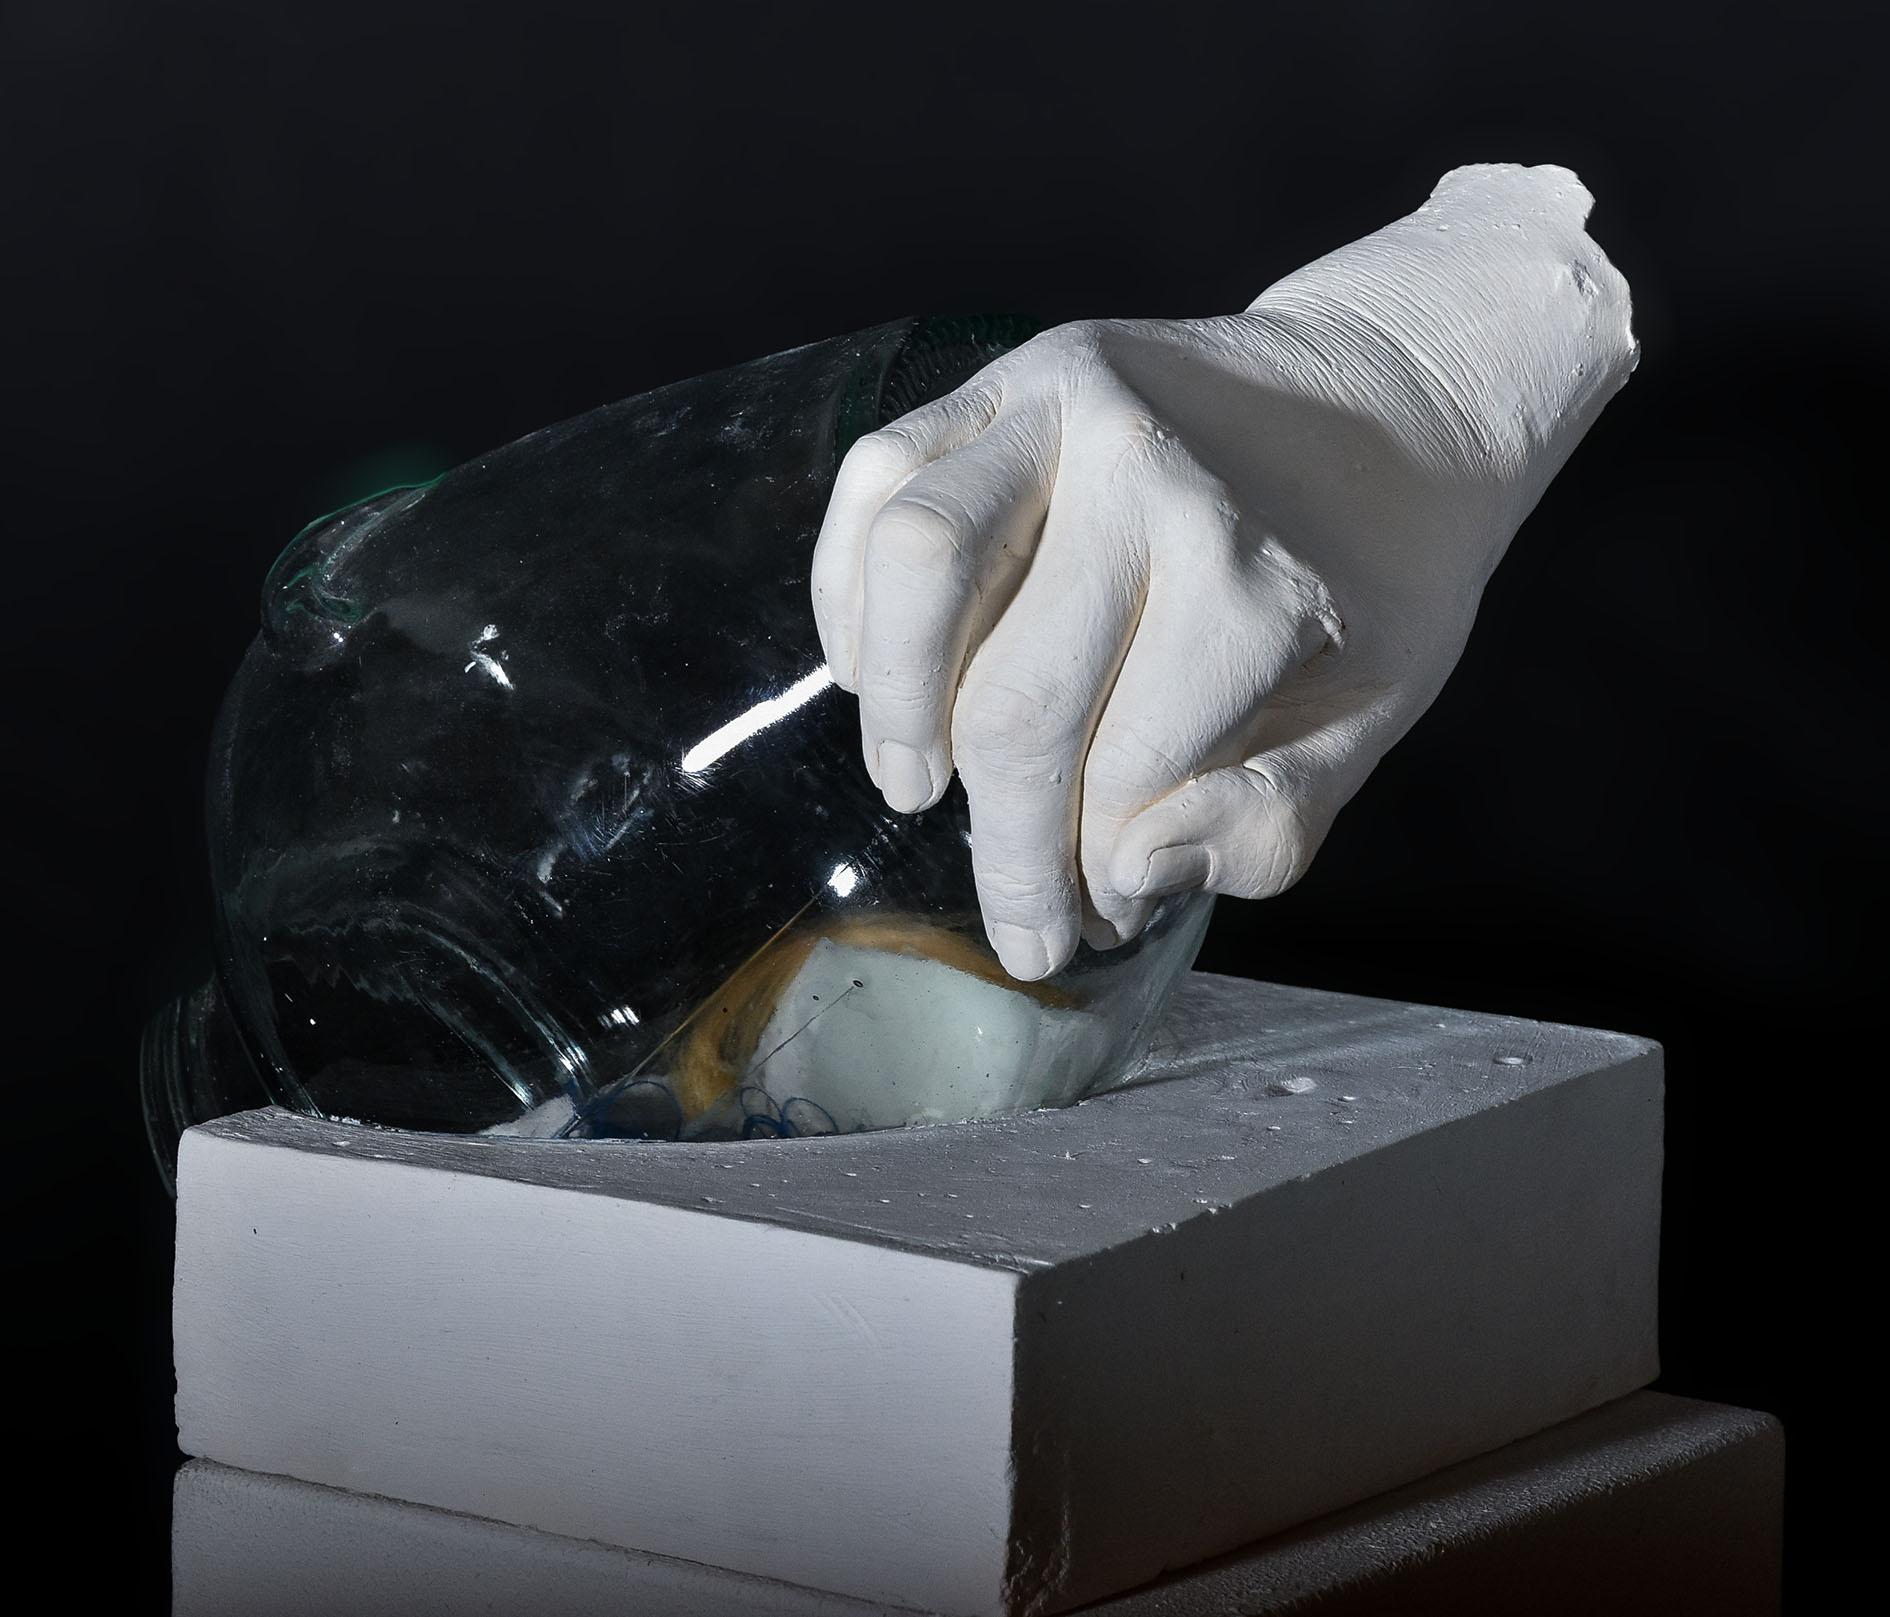 fontaine2017-26b